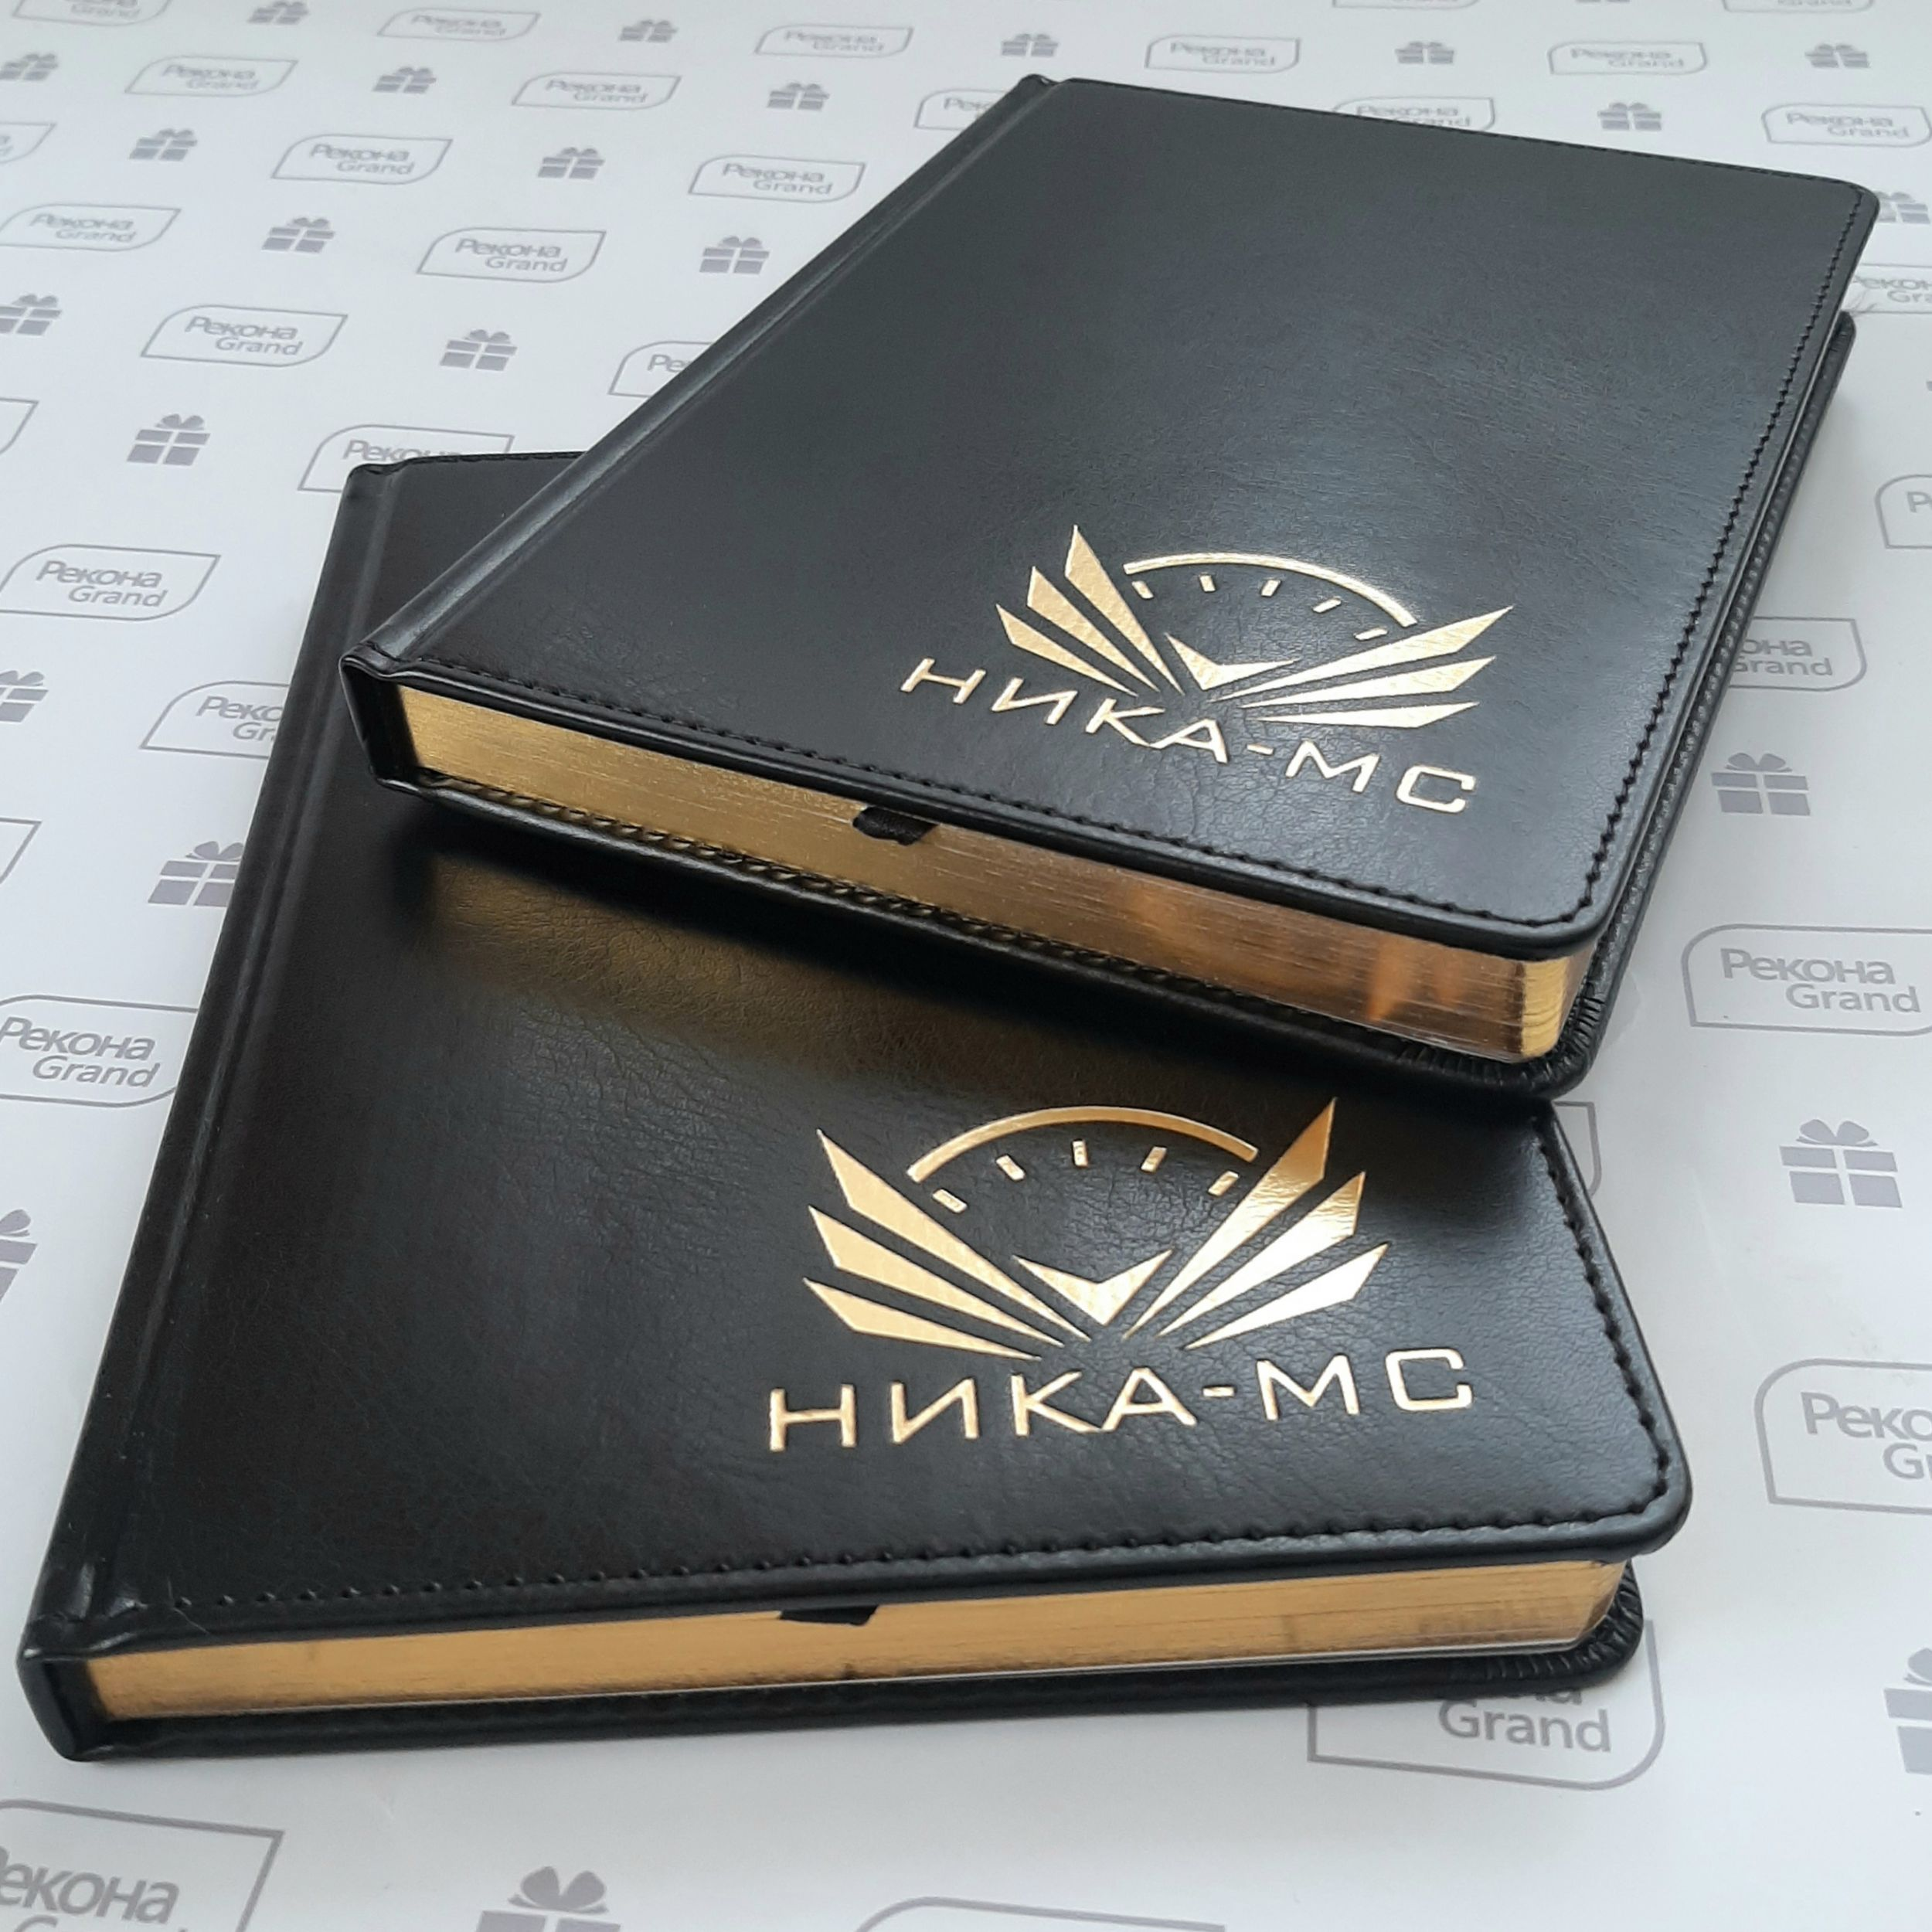 ежедневники с логотипом в иркутске